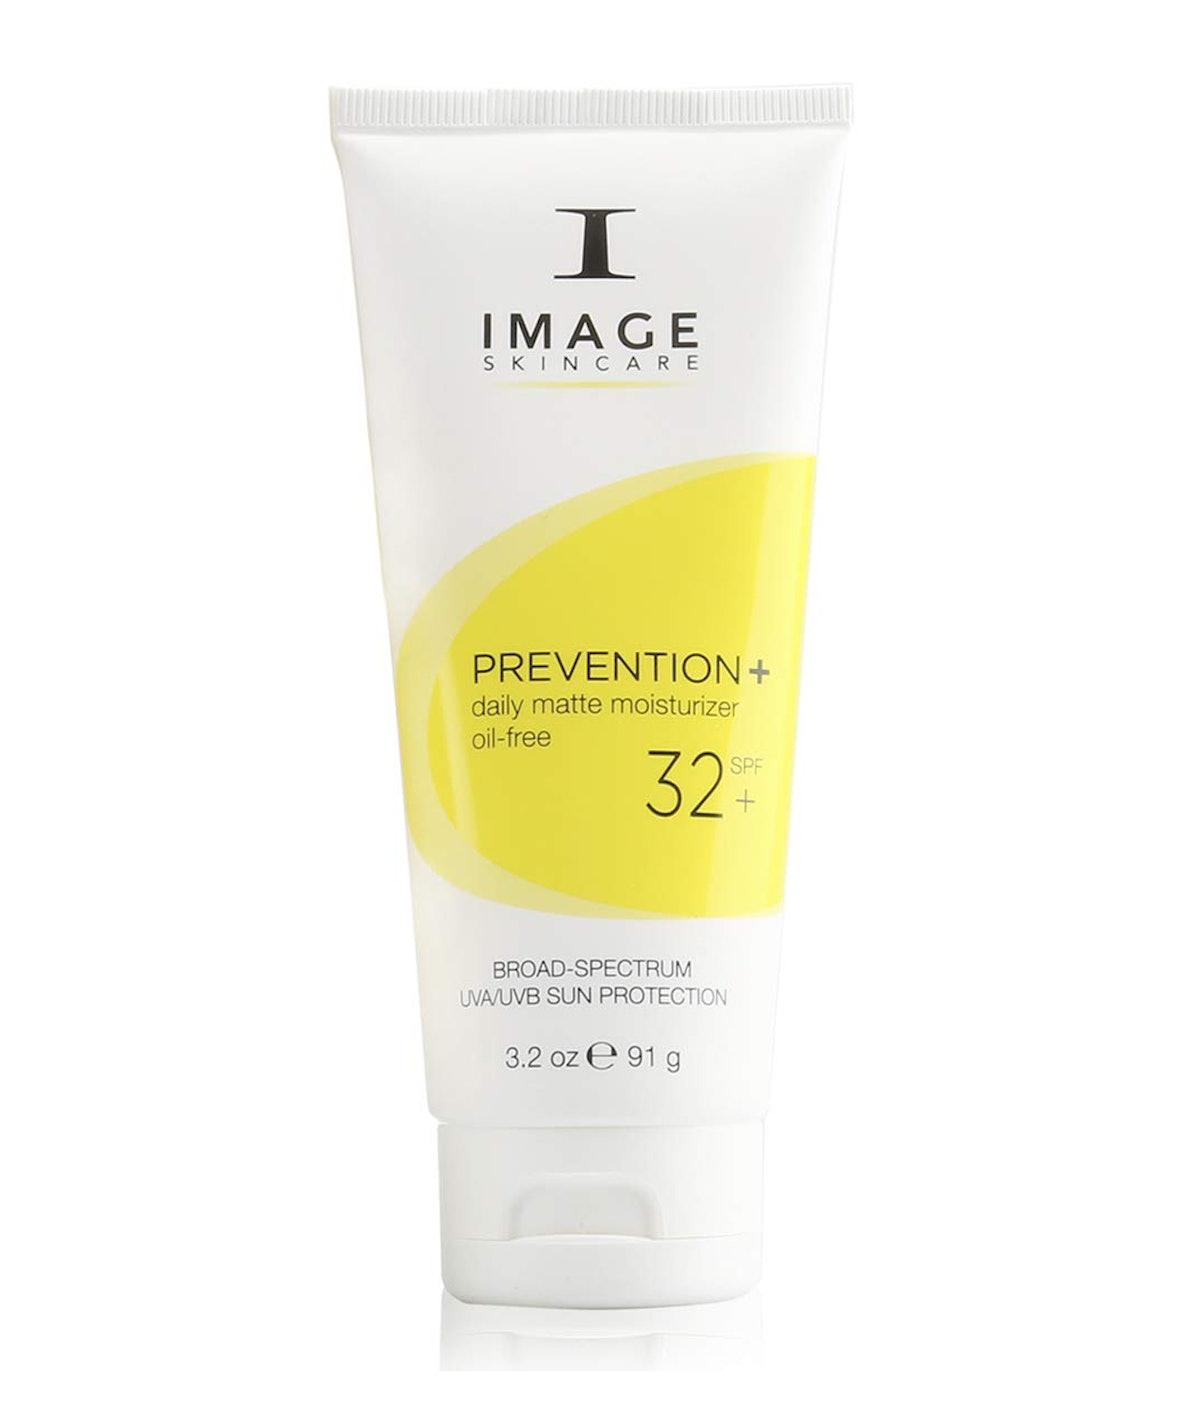 IMAGE Skincare Prevention+ Daily Matte Moisturizer SPF 32+